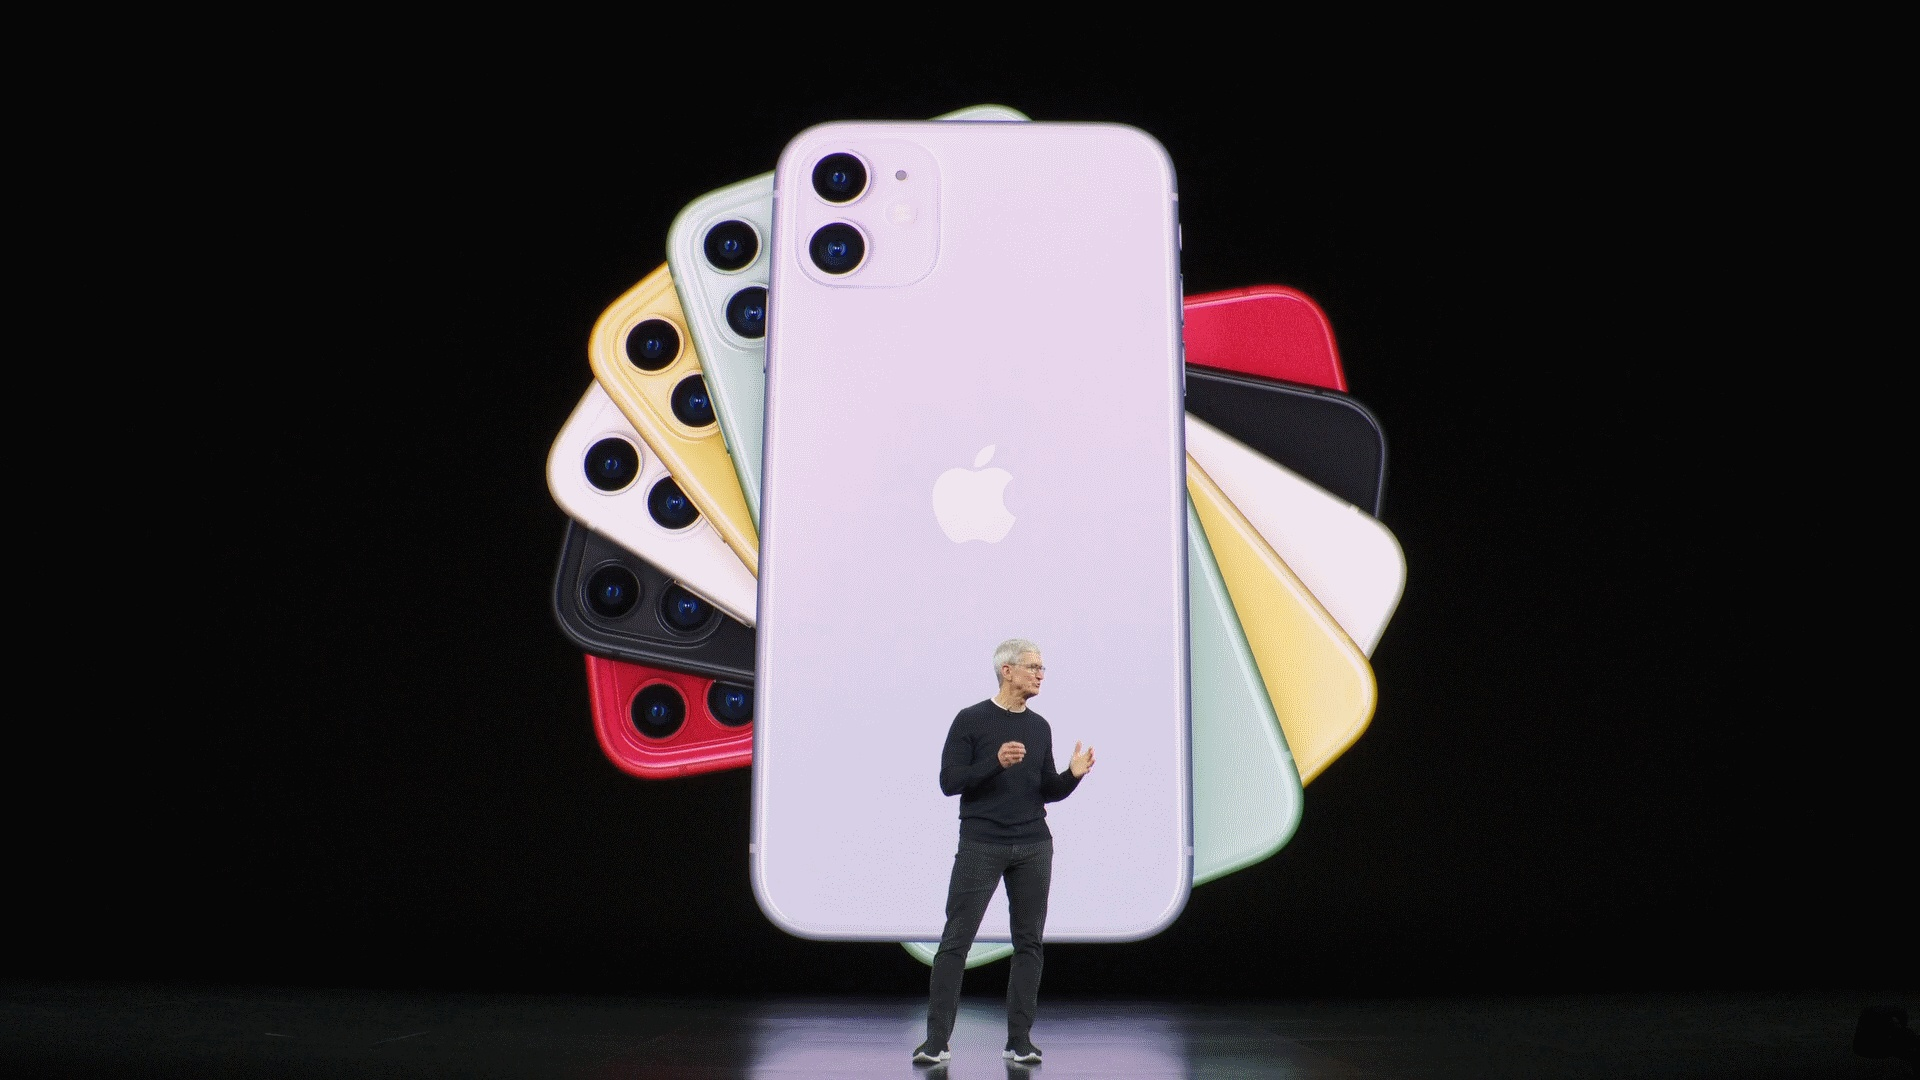 iphone 11 ausschalten